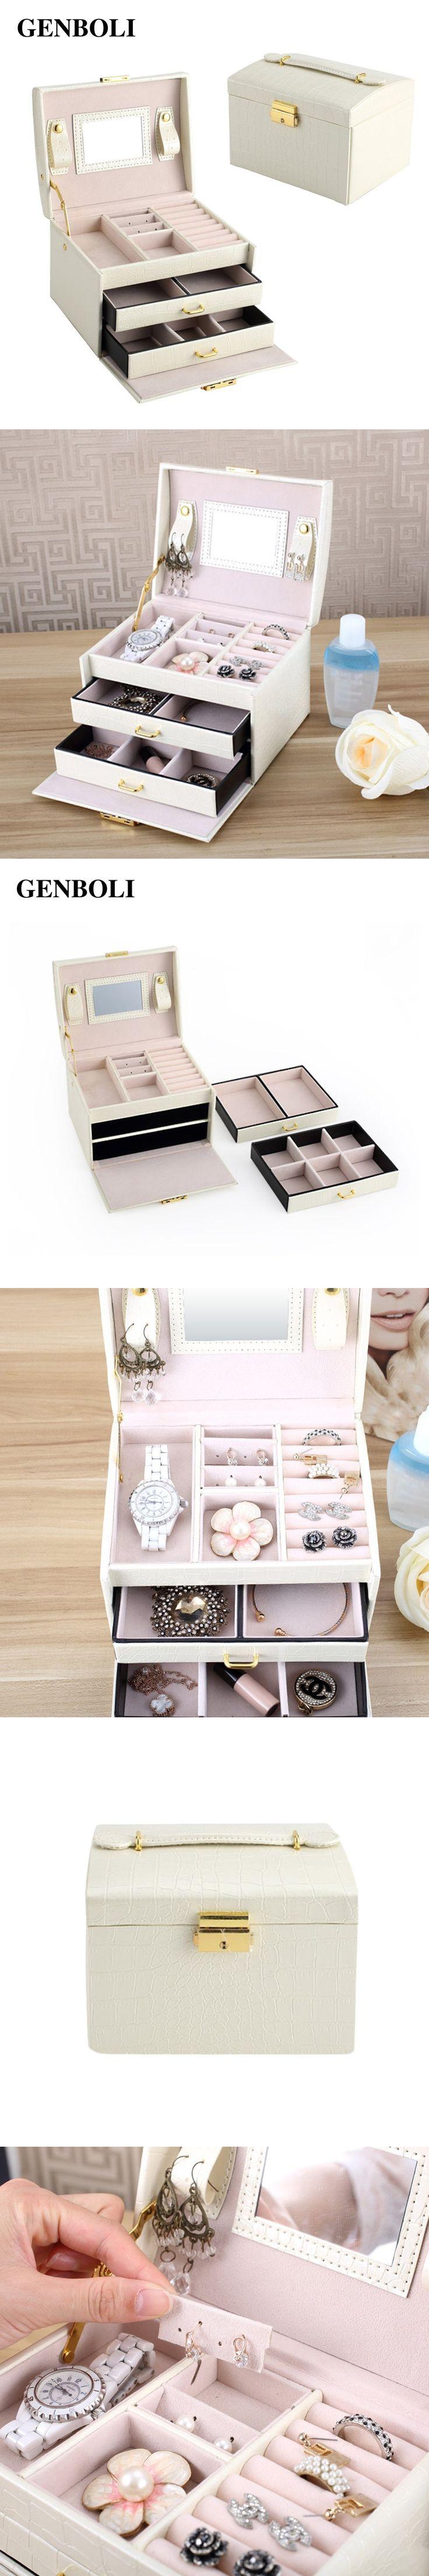 GENBOLI Jewelry Box Rings Bracelet Leather Jewelry Casket Organizer Display Makeup Storage Drawers Box Case with Mirror